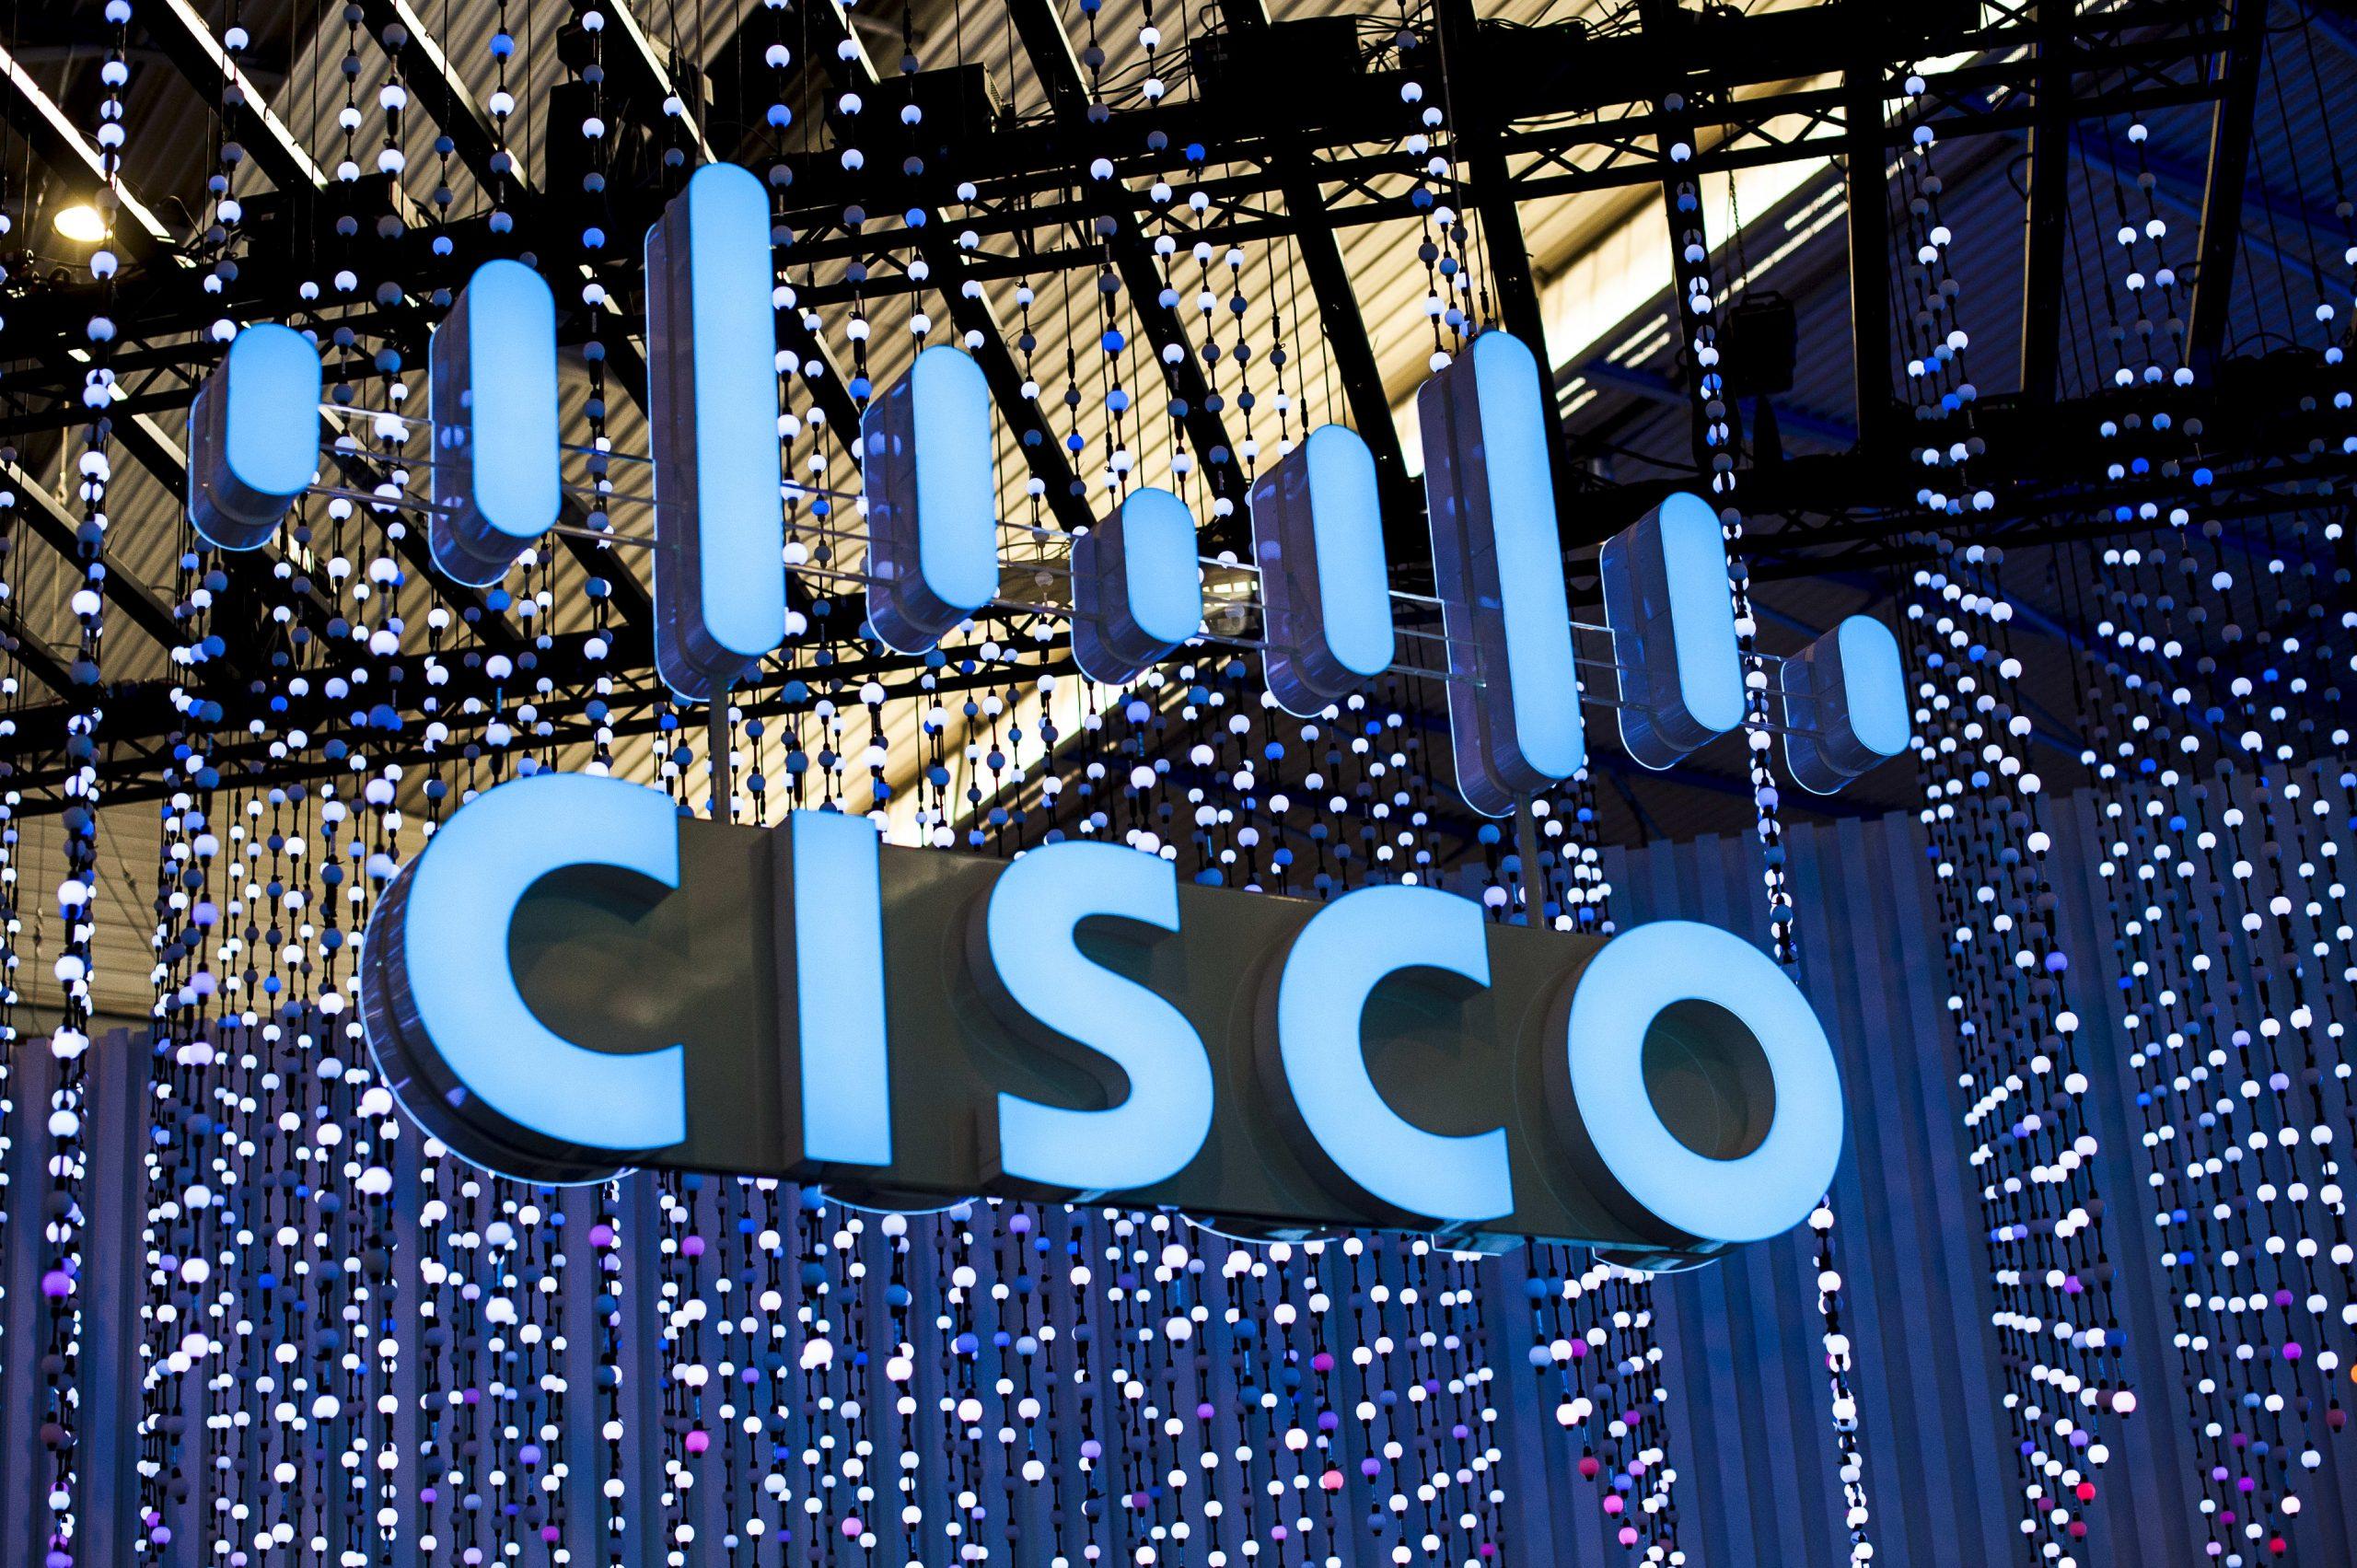 Акции Cisco - прогноз и цена в 2021 году